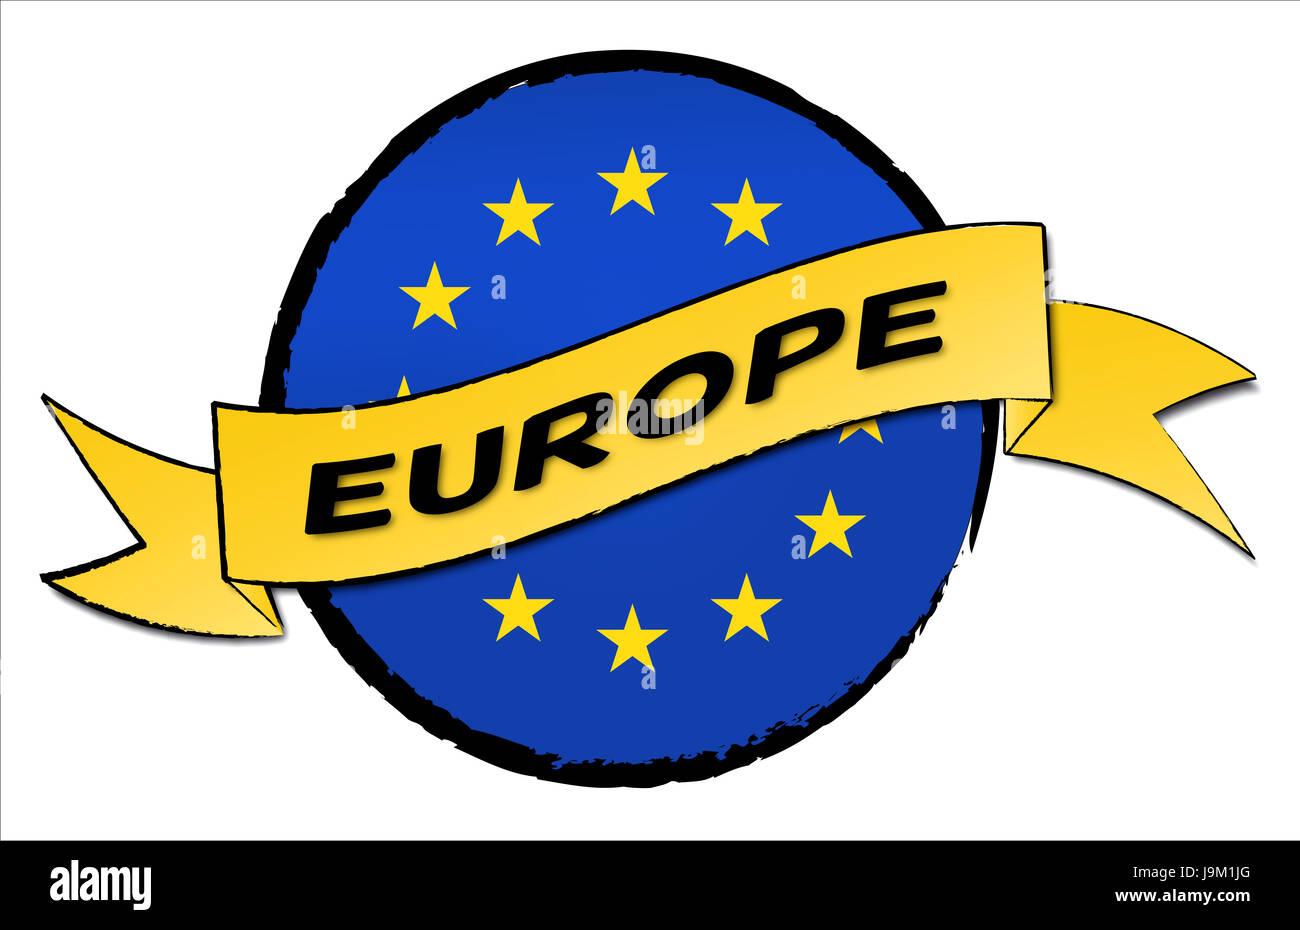 euro, england, union, travel, holiday, vacation, holidays, vacations, greece, - Stock Image